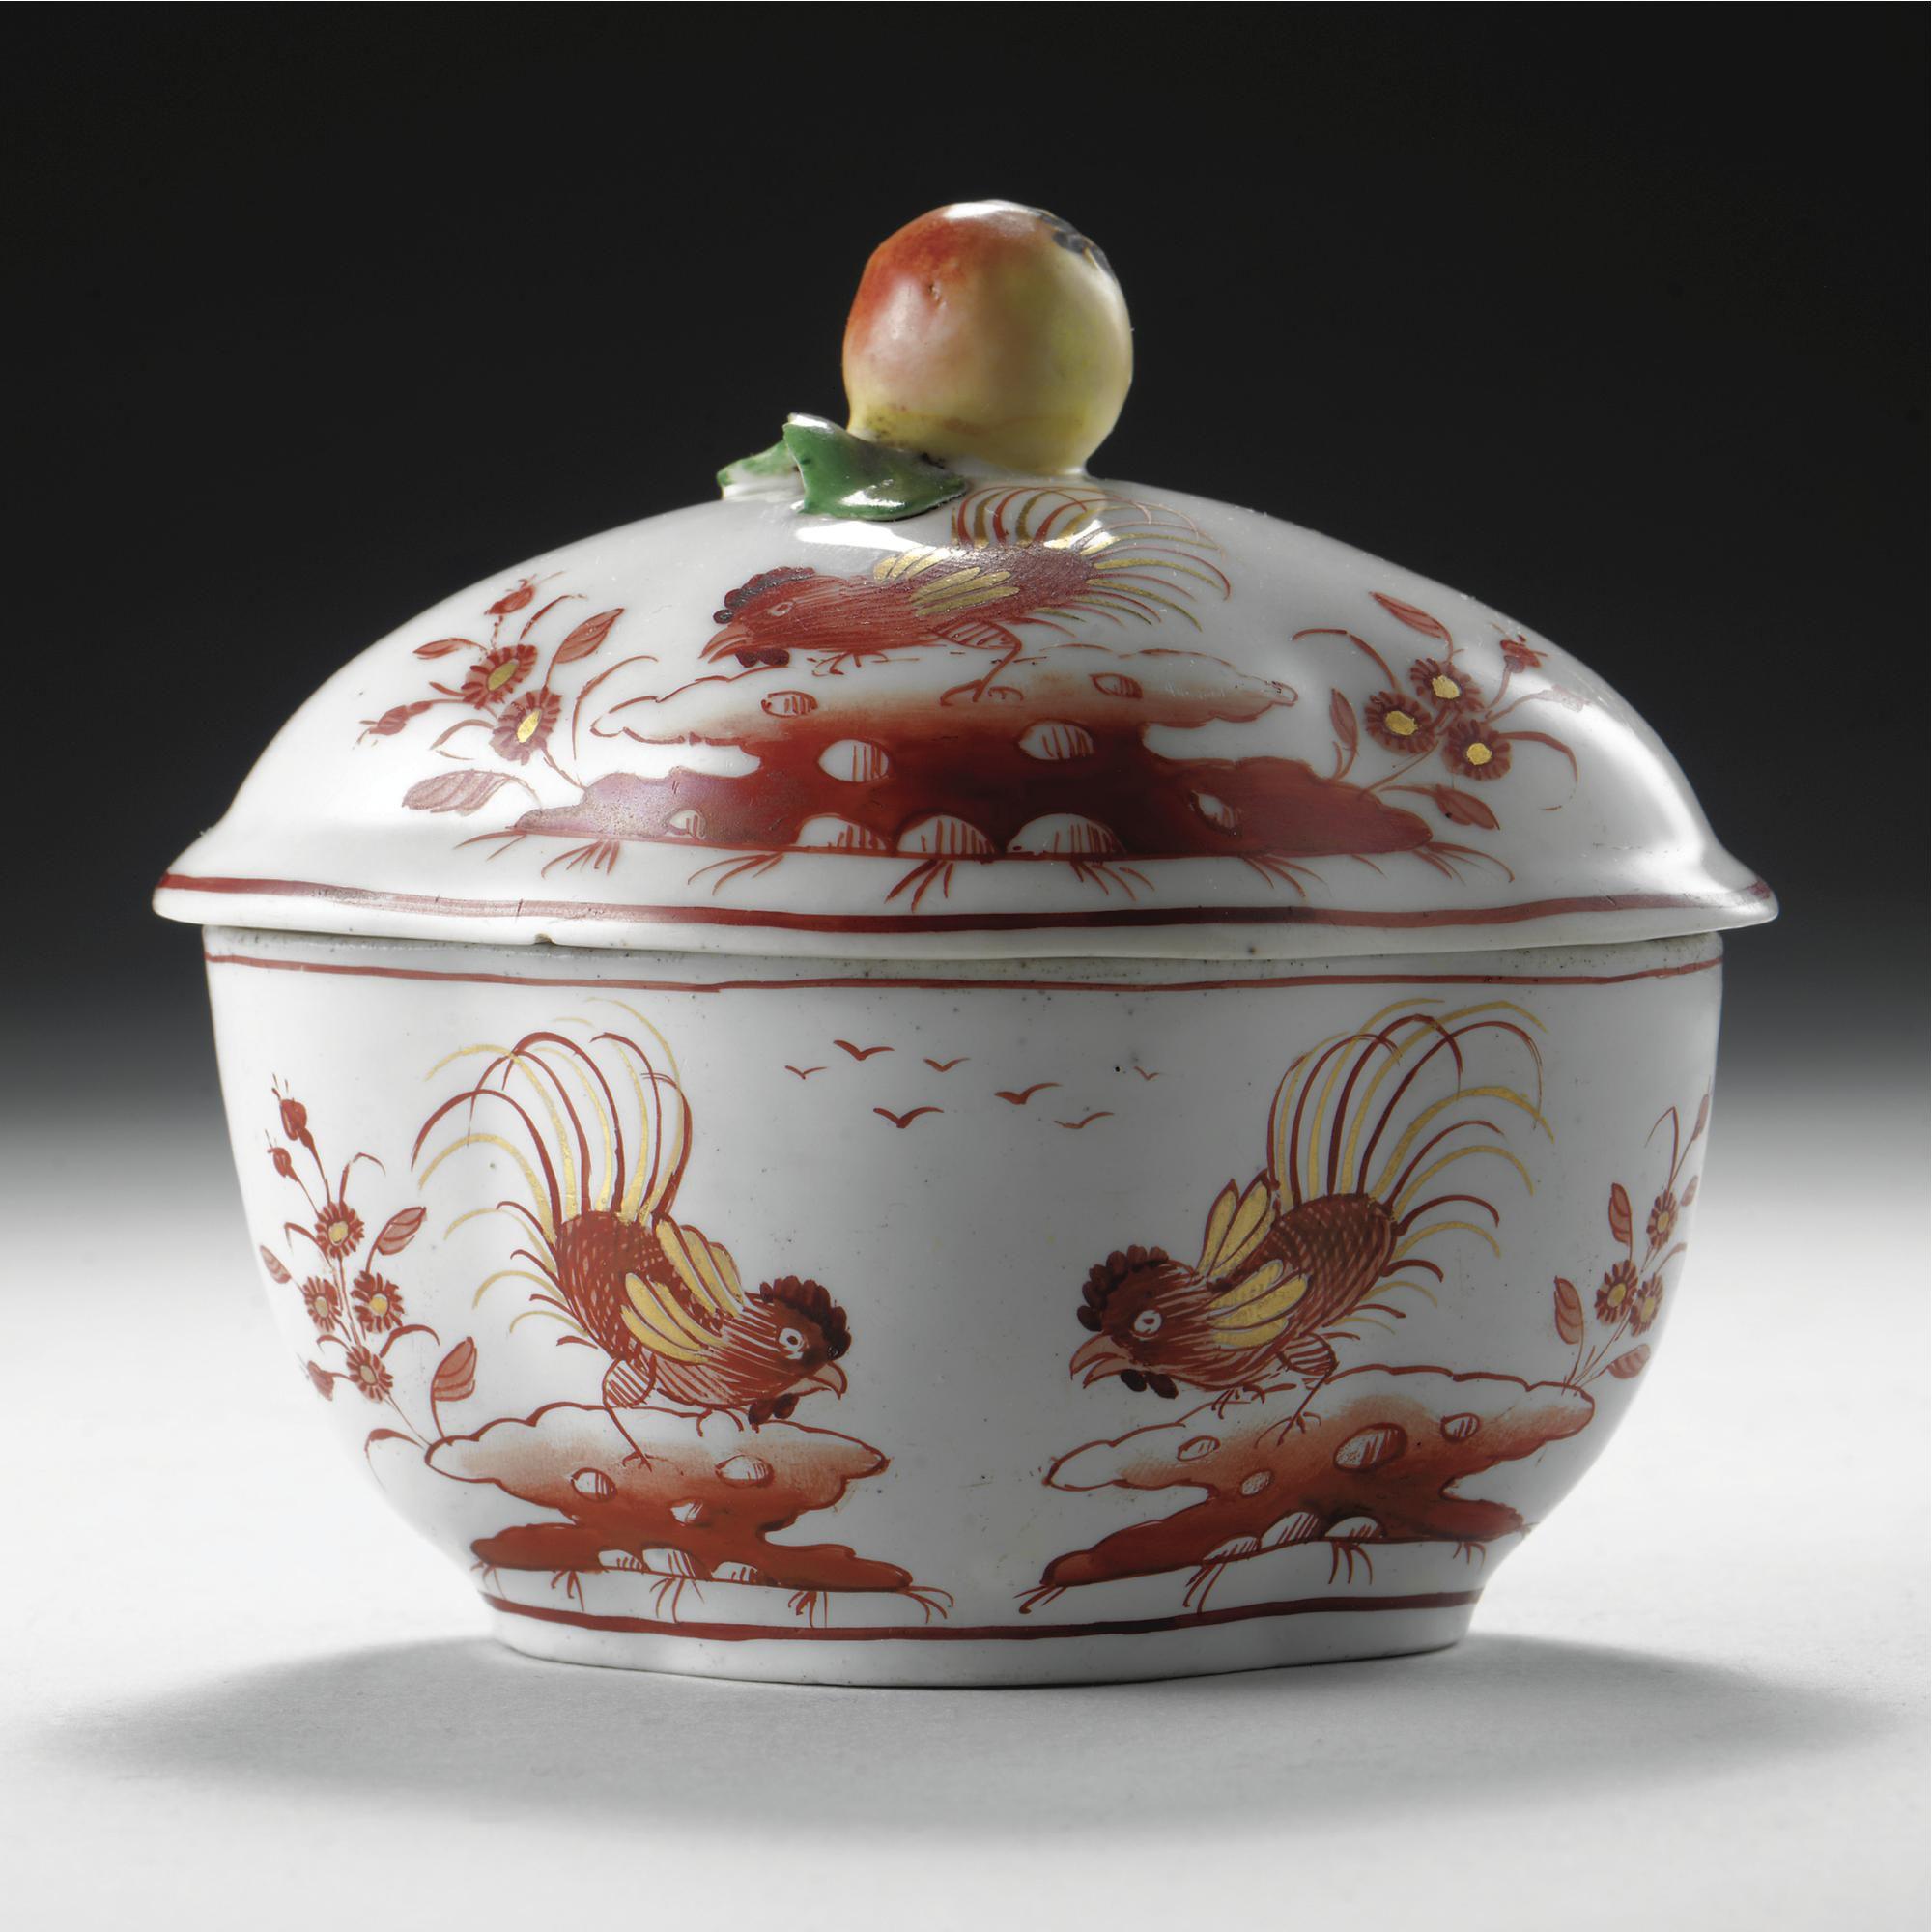 A Doccia Porcelain Sugar Pot Late 18th Century Porcellana